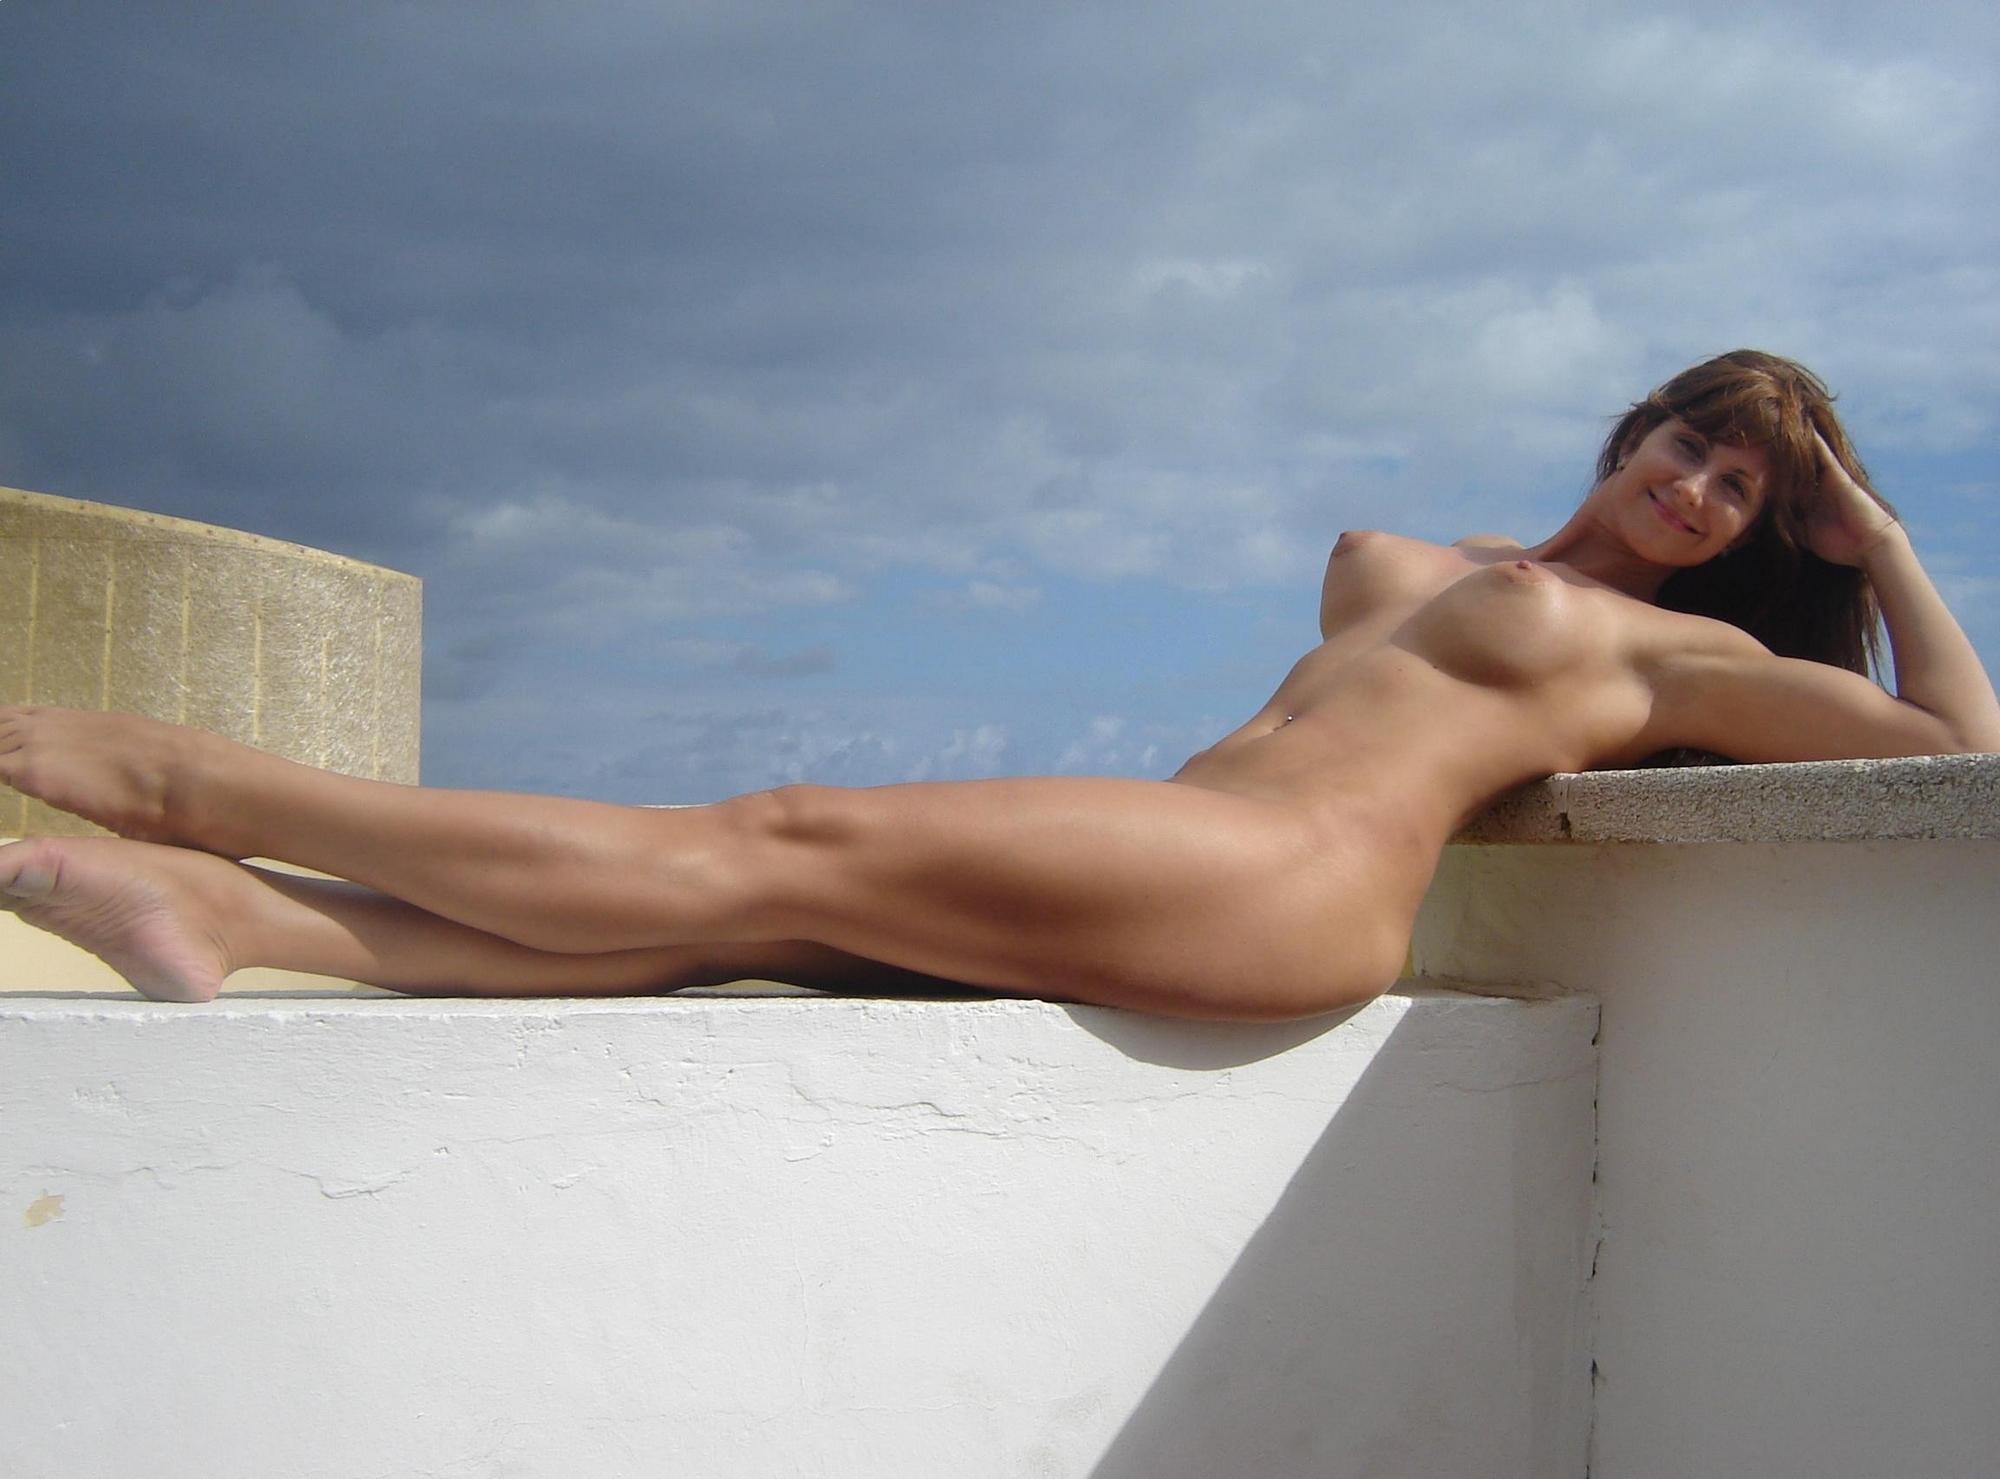 Голая стриптизерша вышла на крышу отеля